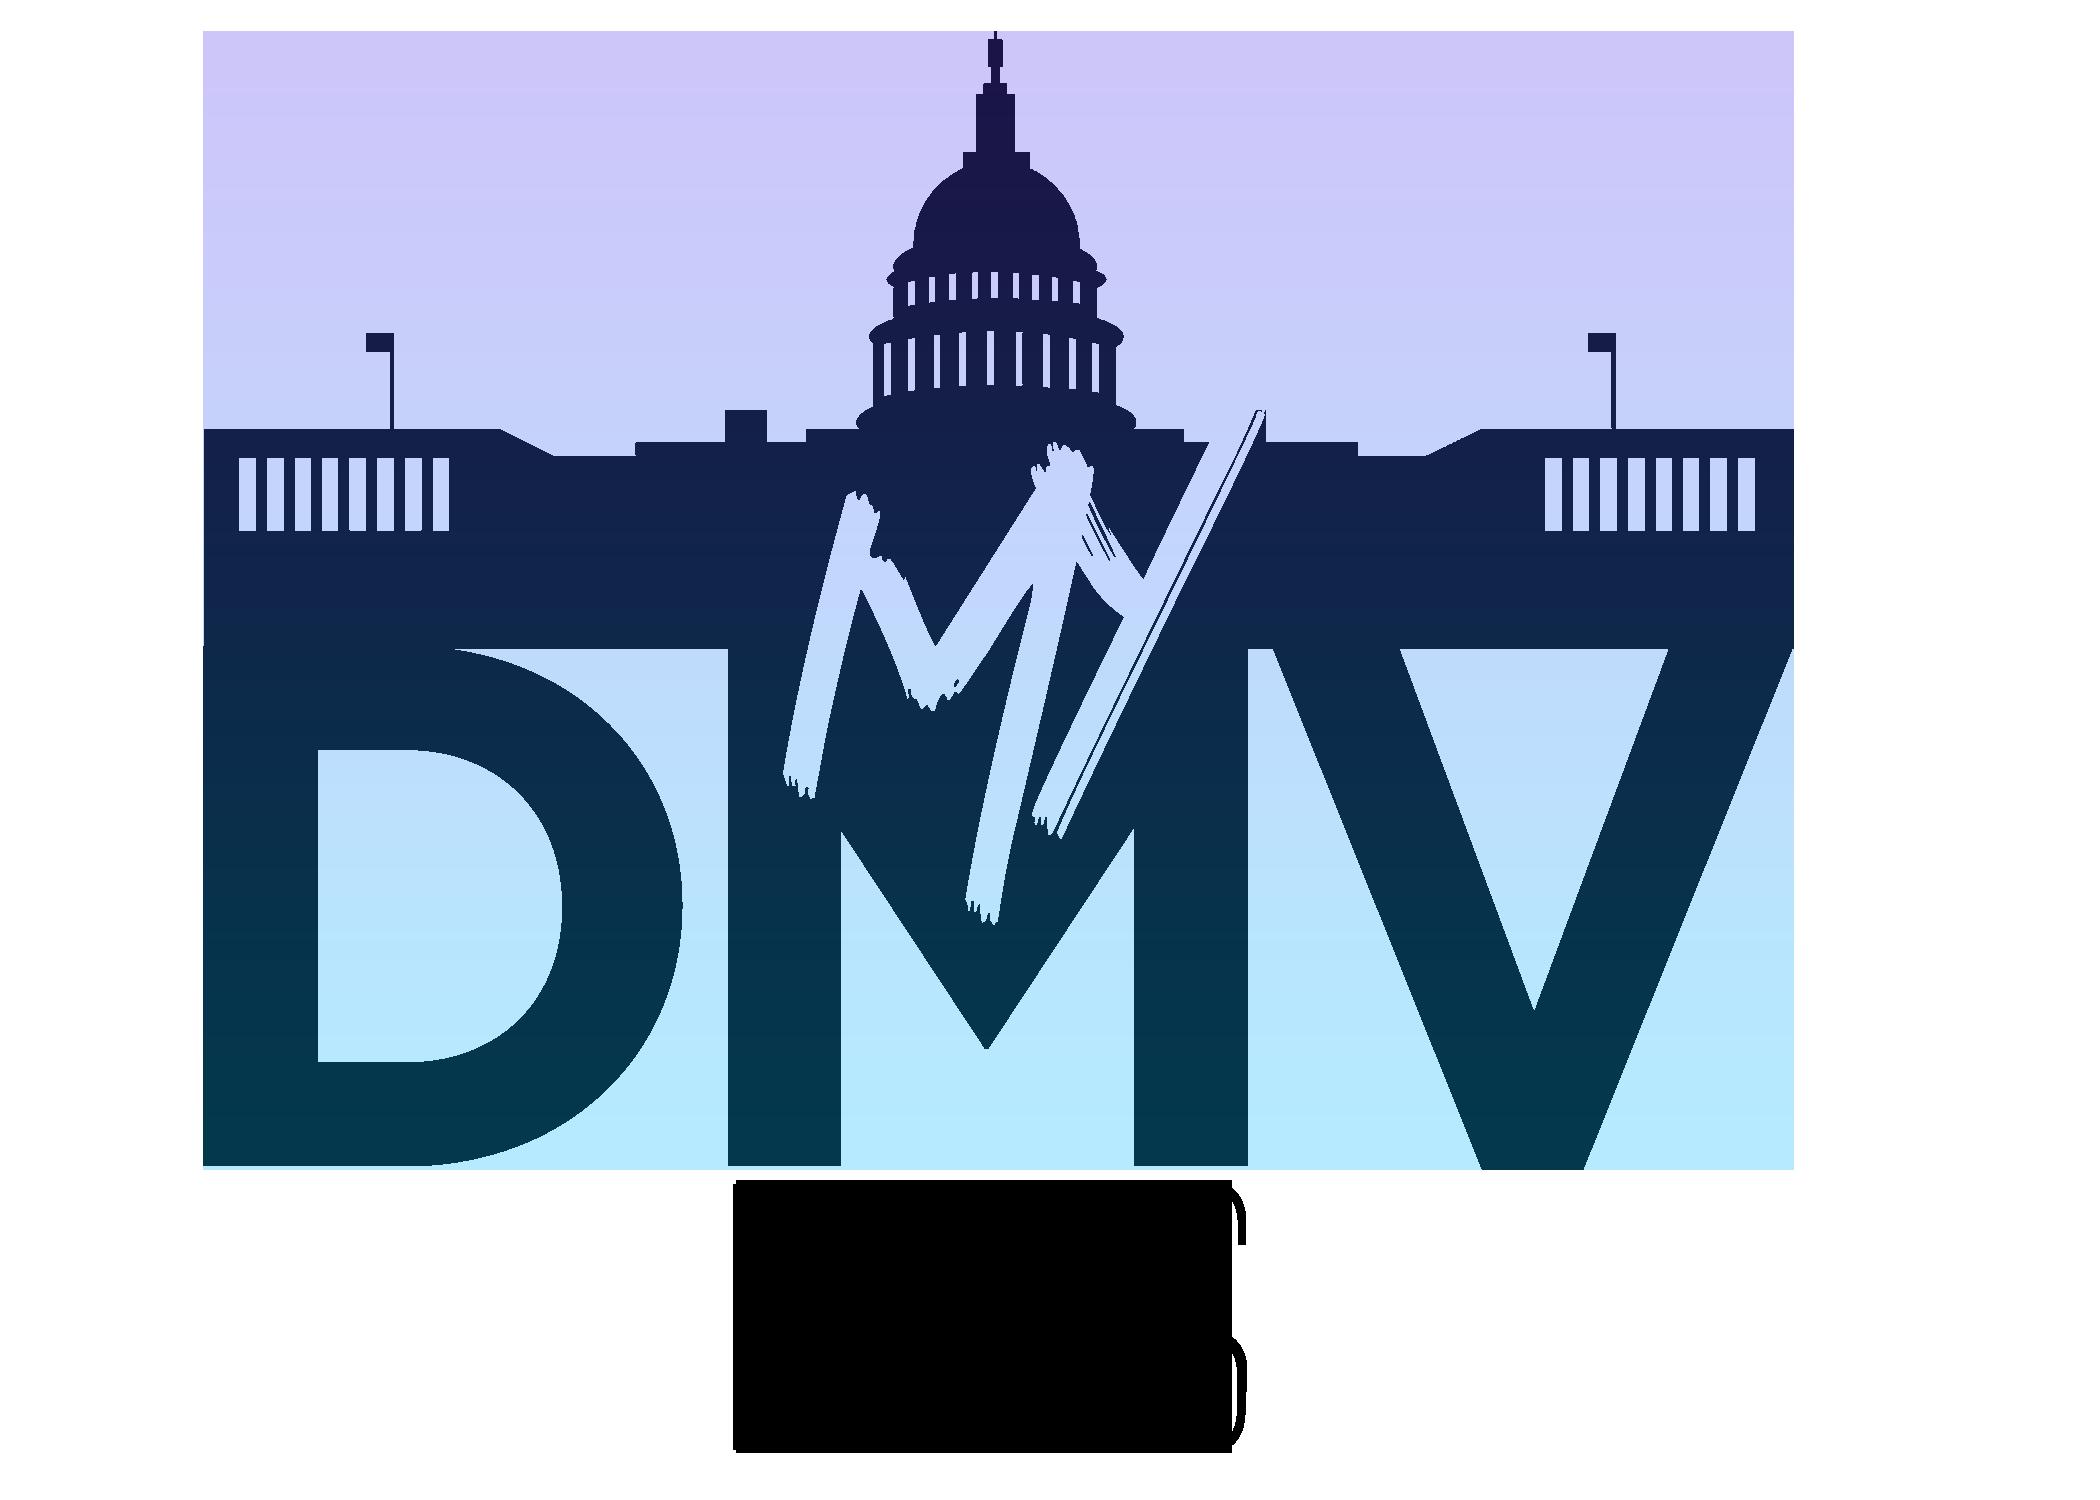 My dmv logo